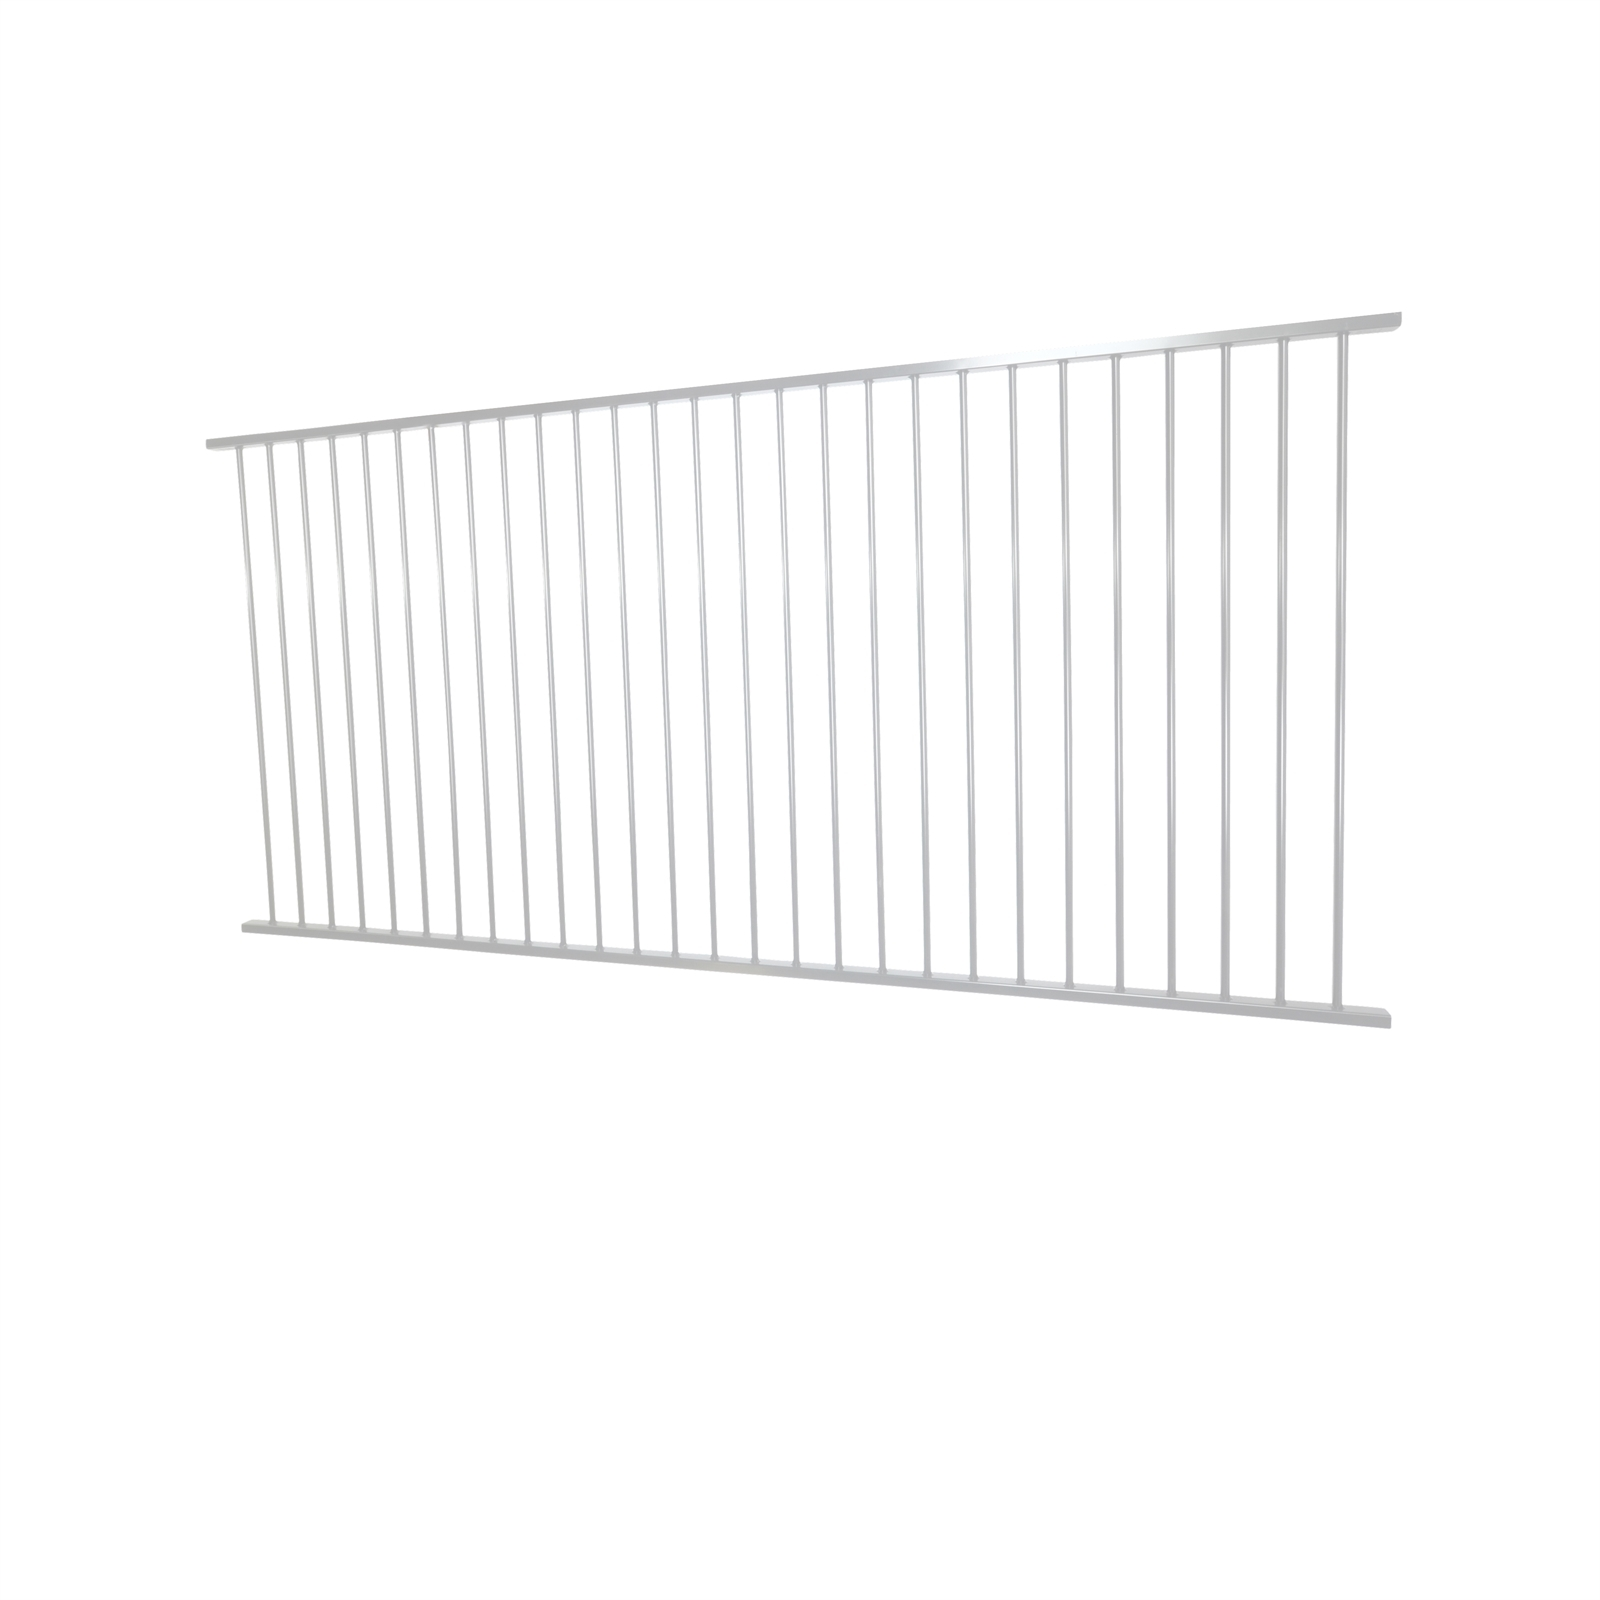 Protector Aluminium 2450 x 1200mm Flat Top Ulti-M8 Fence Panel - Pearl White